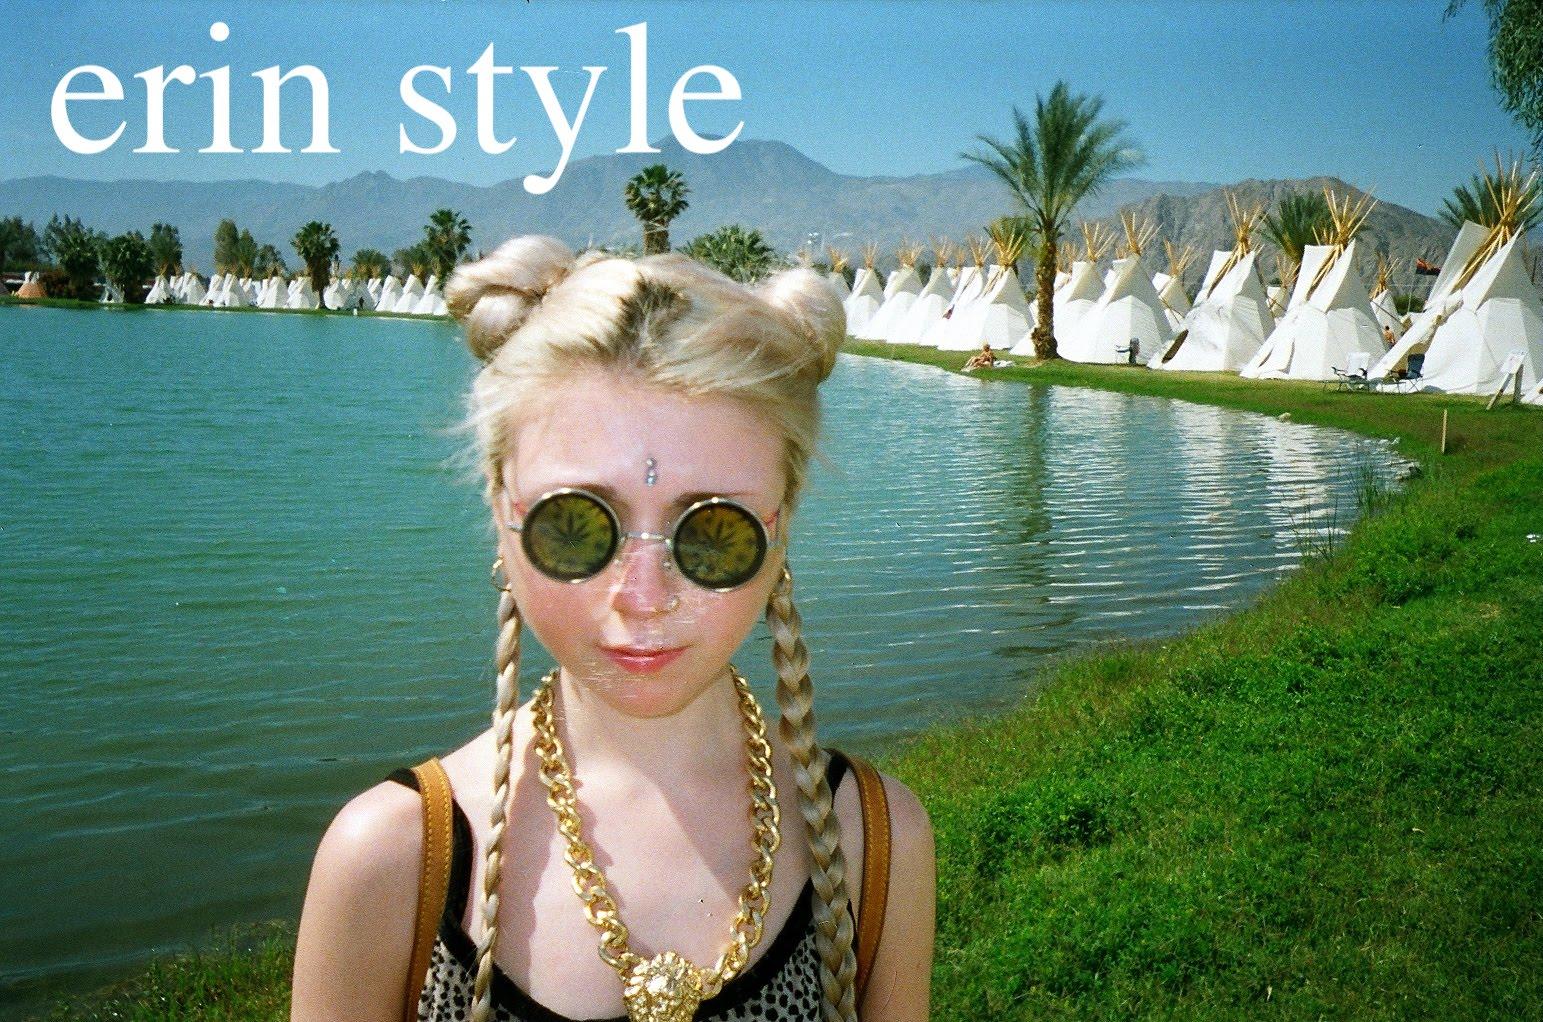 erin style